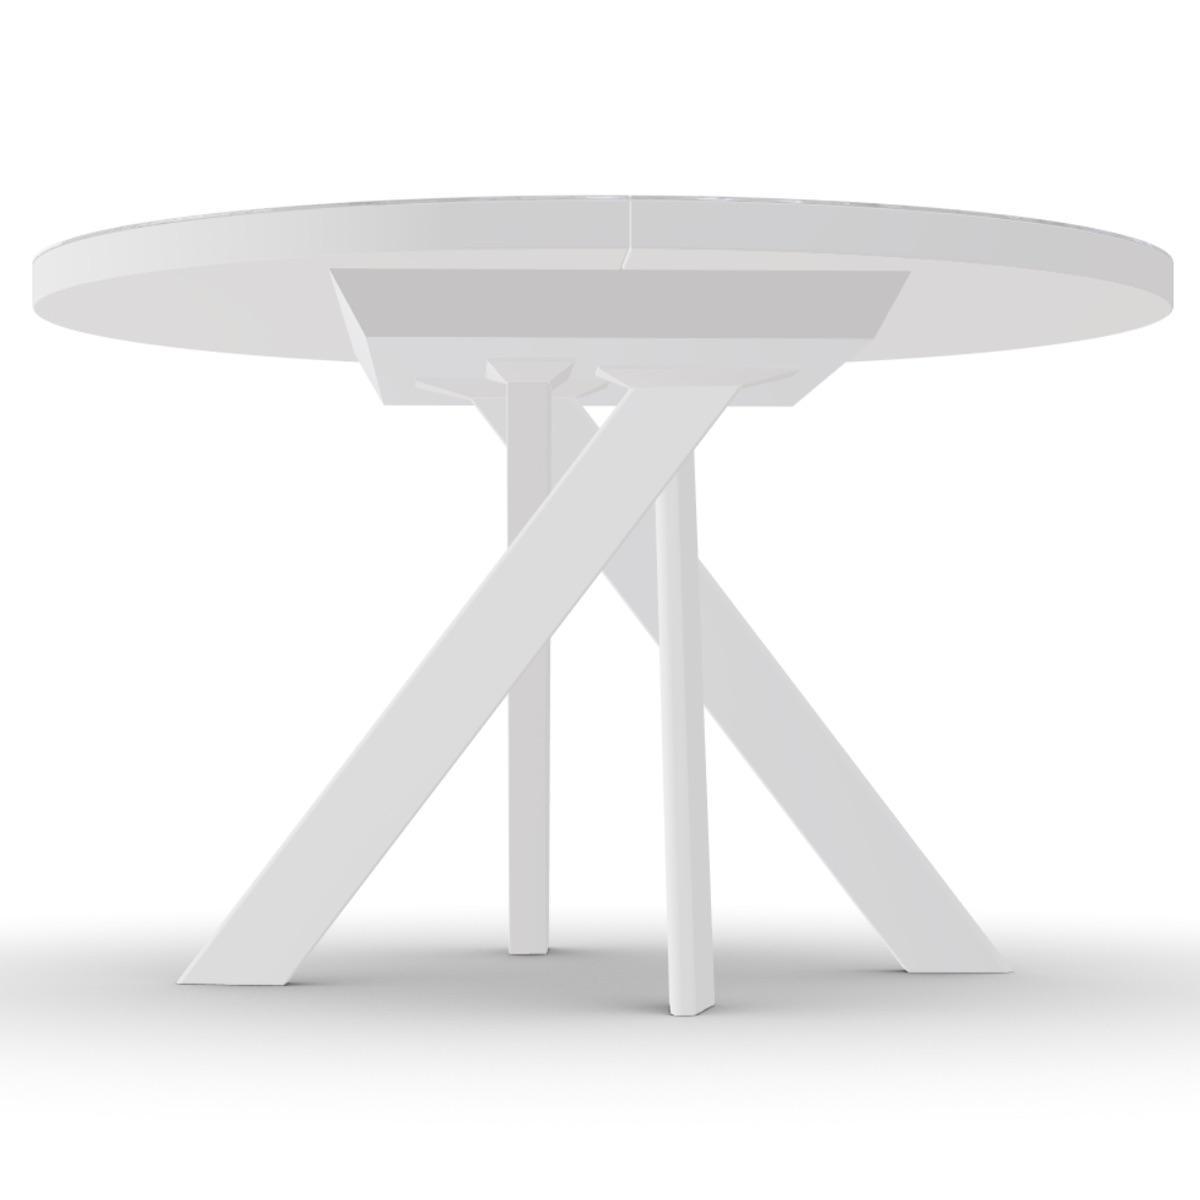 Table à Rallonges 130 190cm Tivoli Calligaris Céramique Marbre Blanc